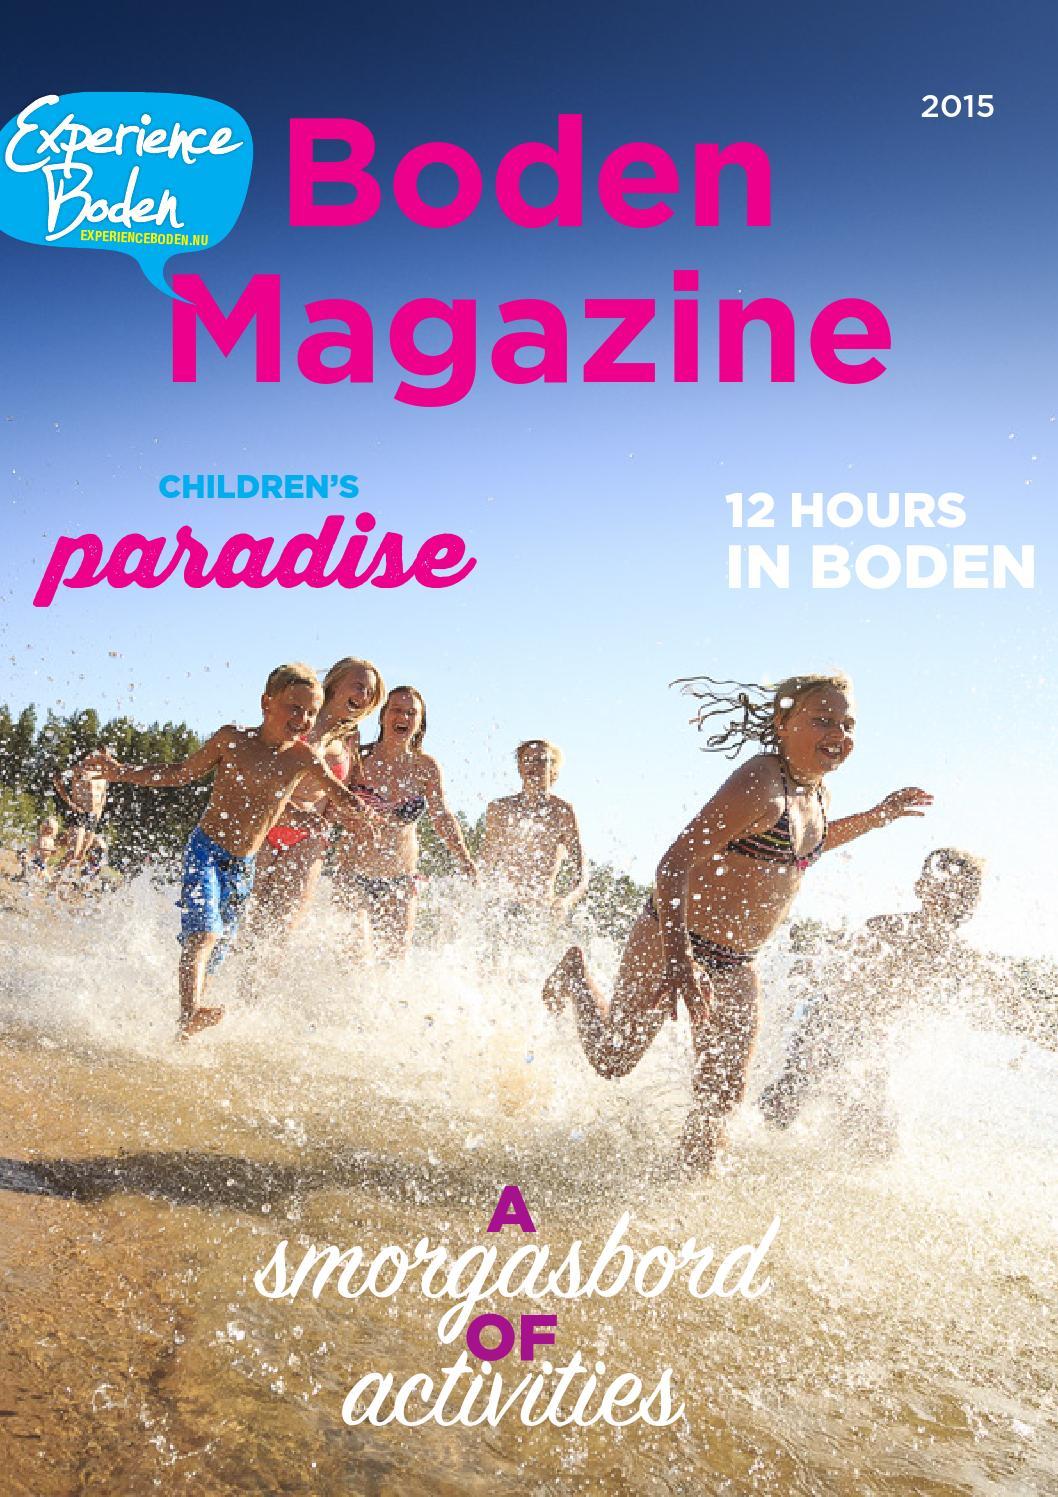 Boden magazine summer 2015 by upplev boden issuu for Boden winter preview 2015